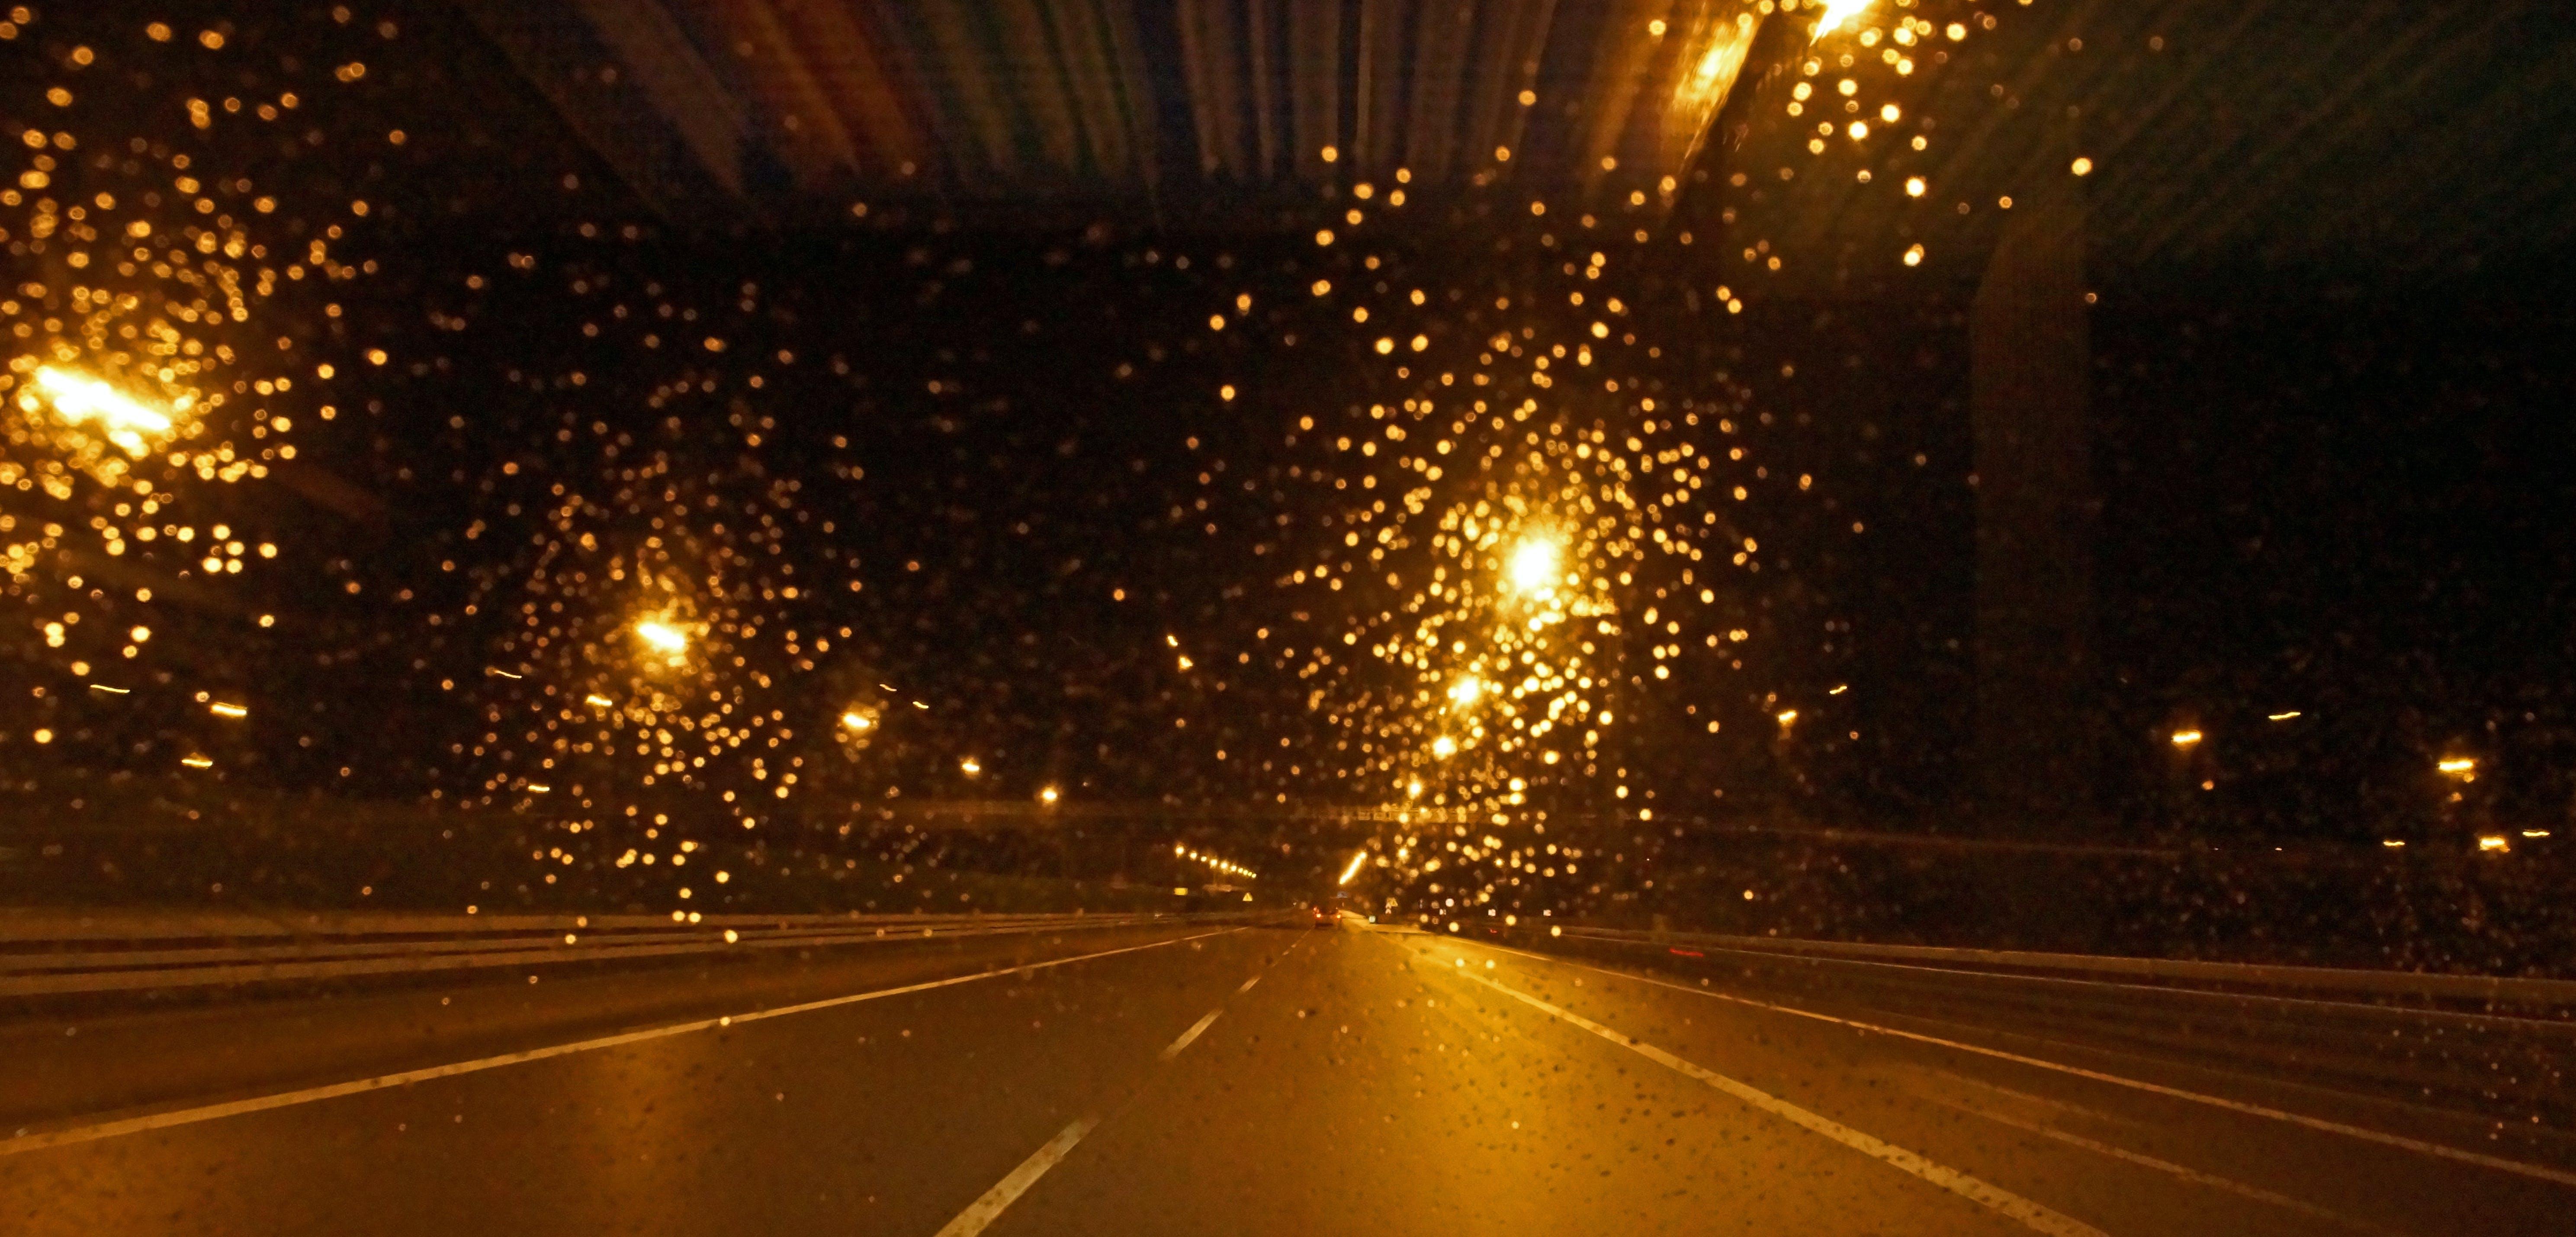 Free stock photo of car, rain